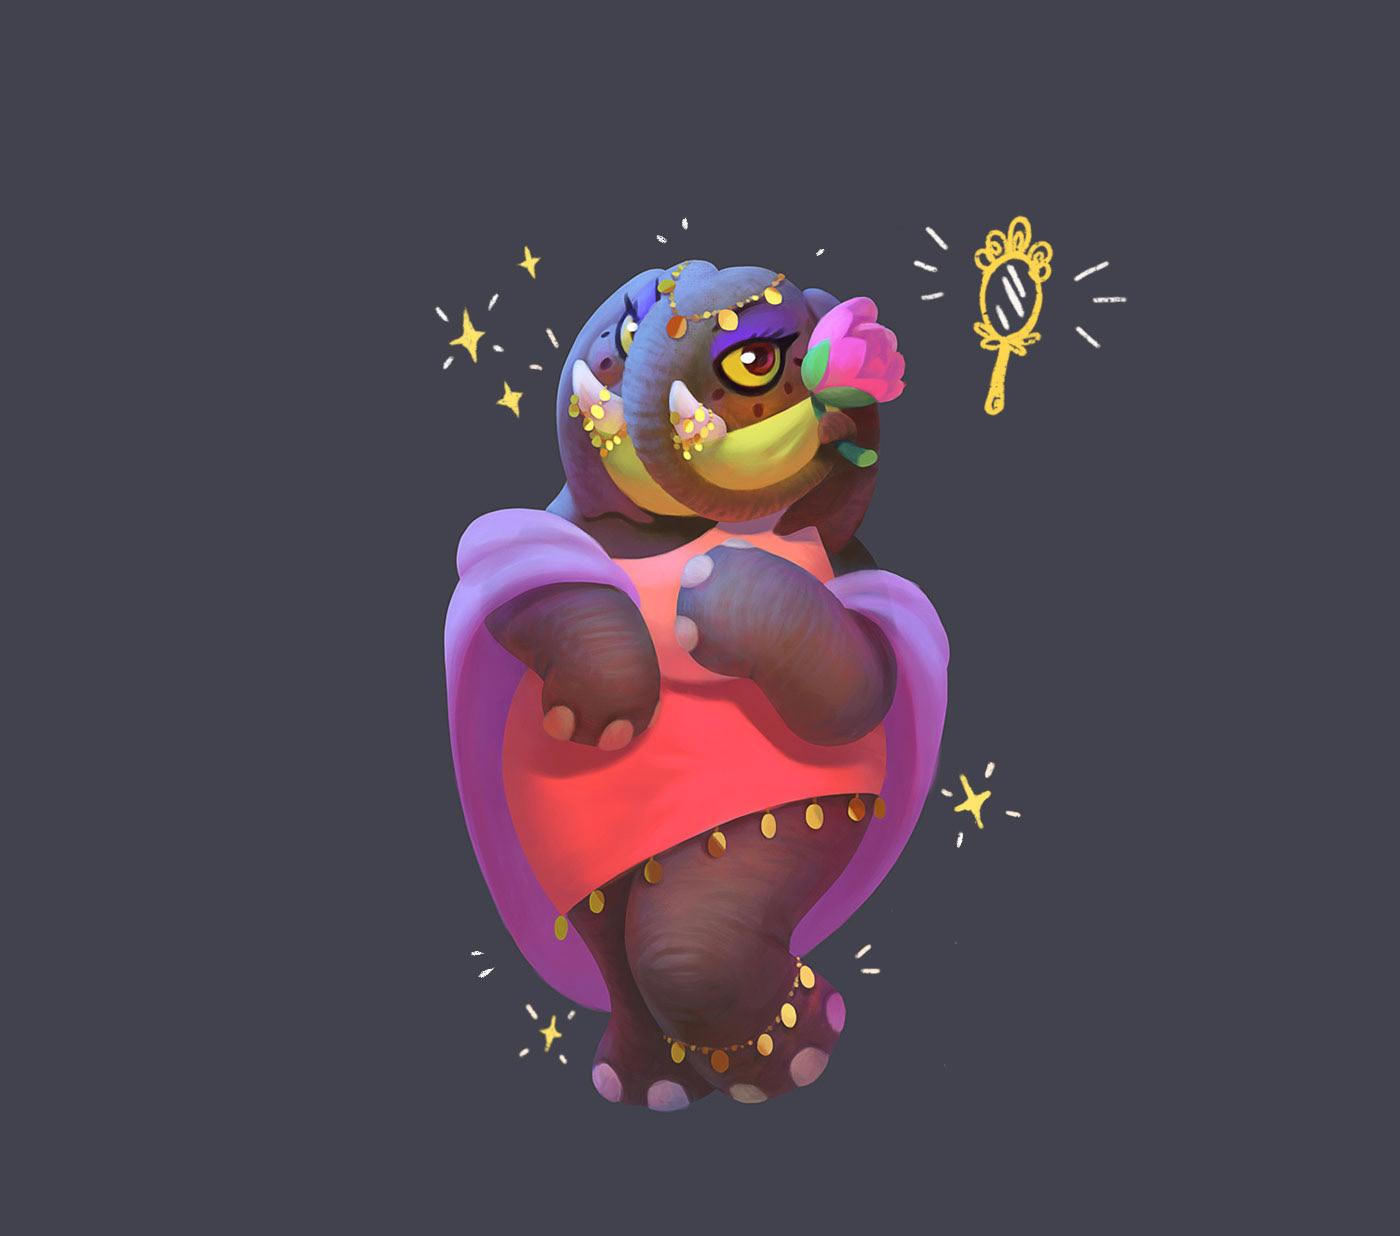 animals cartoon characters cute Mascot